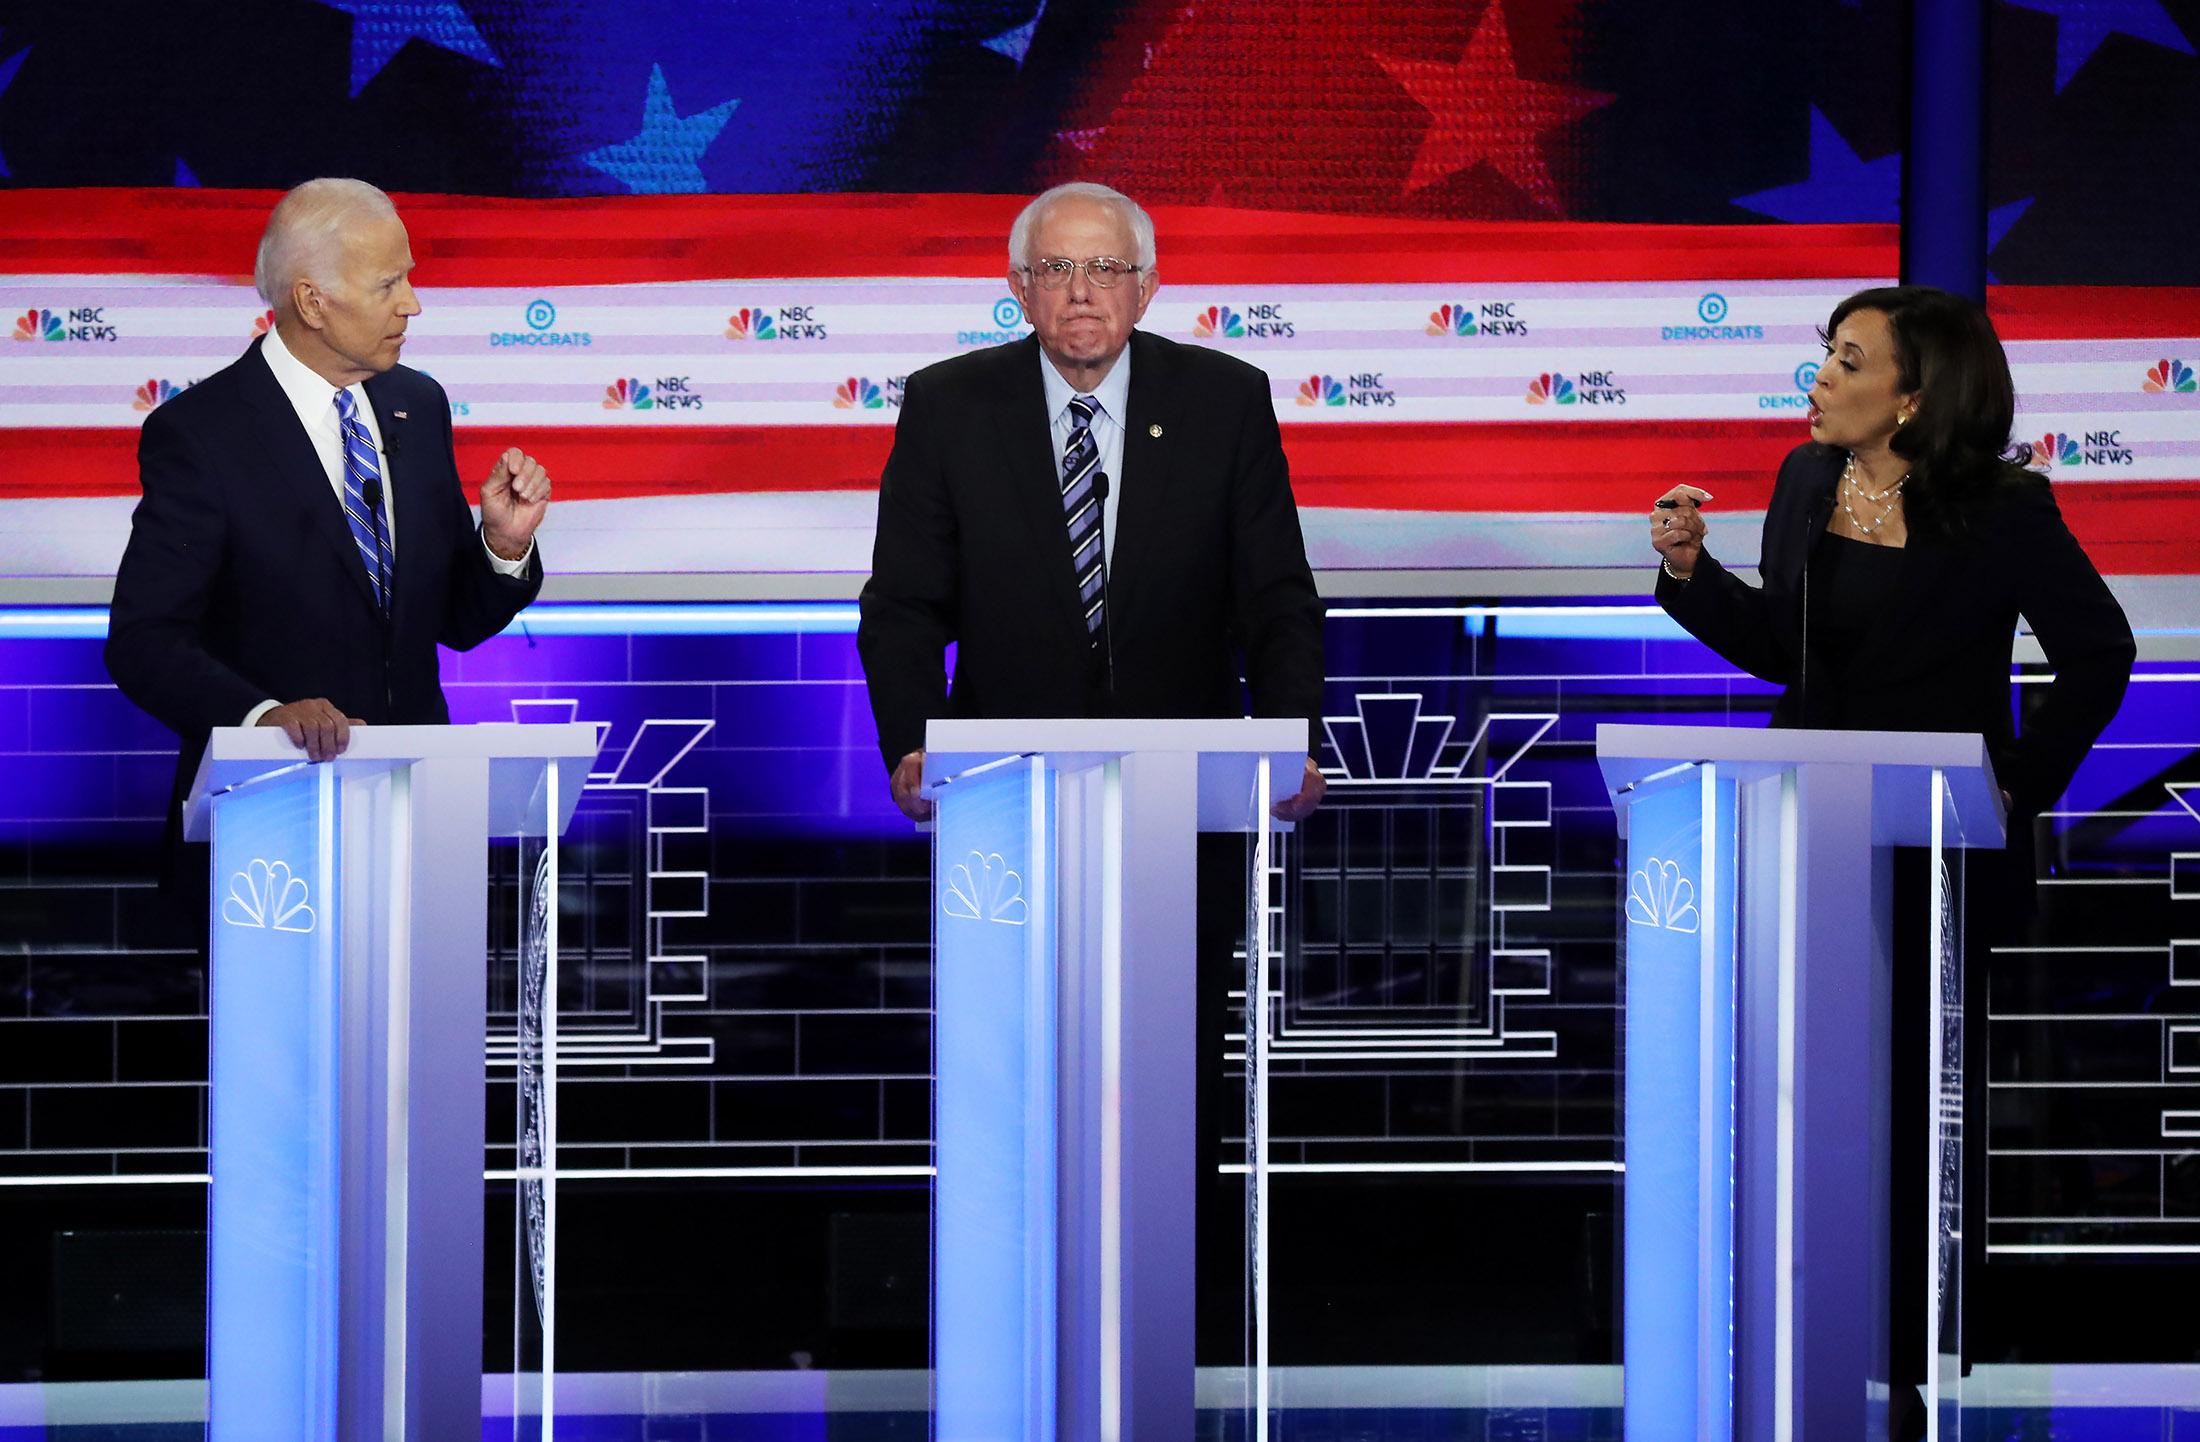 Harris Lights Into Biden as Democratic Debate Turns Testy